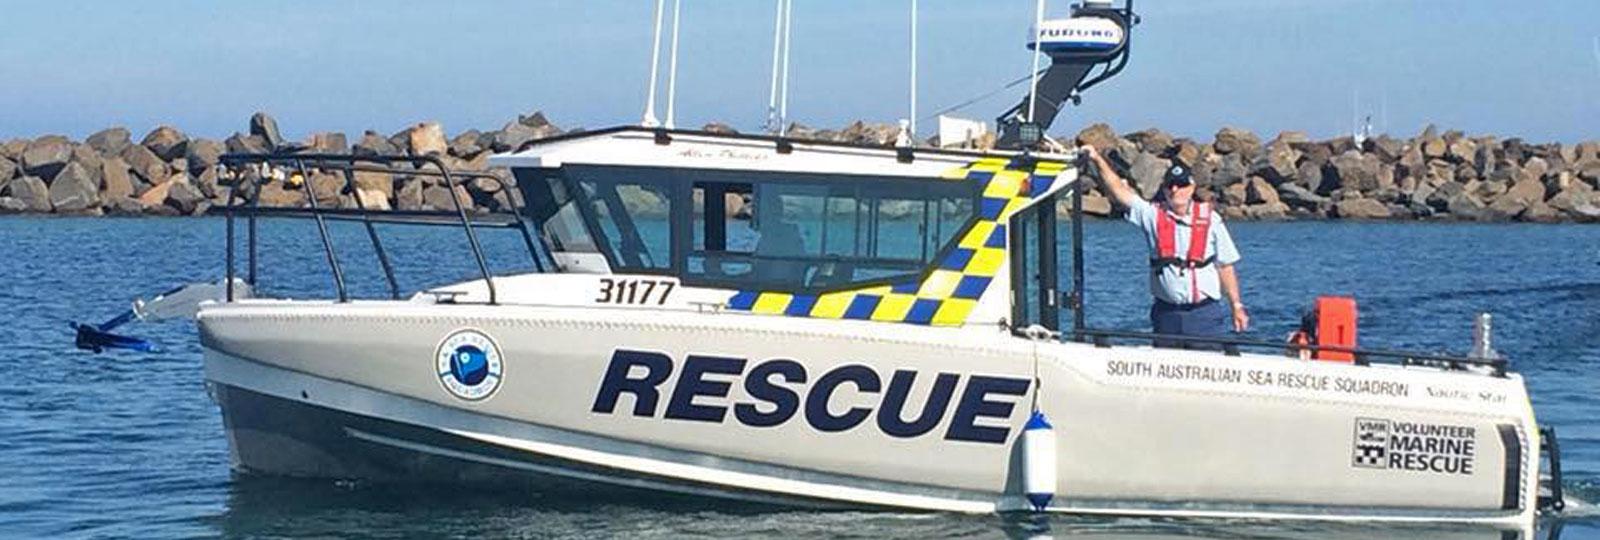 SES Volunteer in a Marine Rescue boat